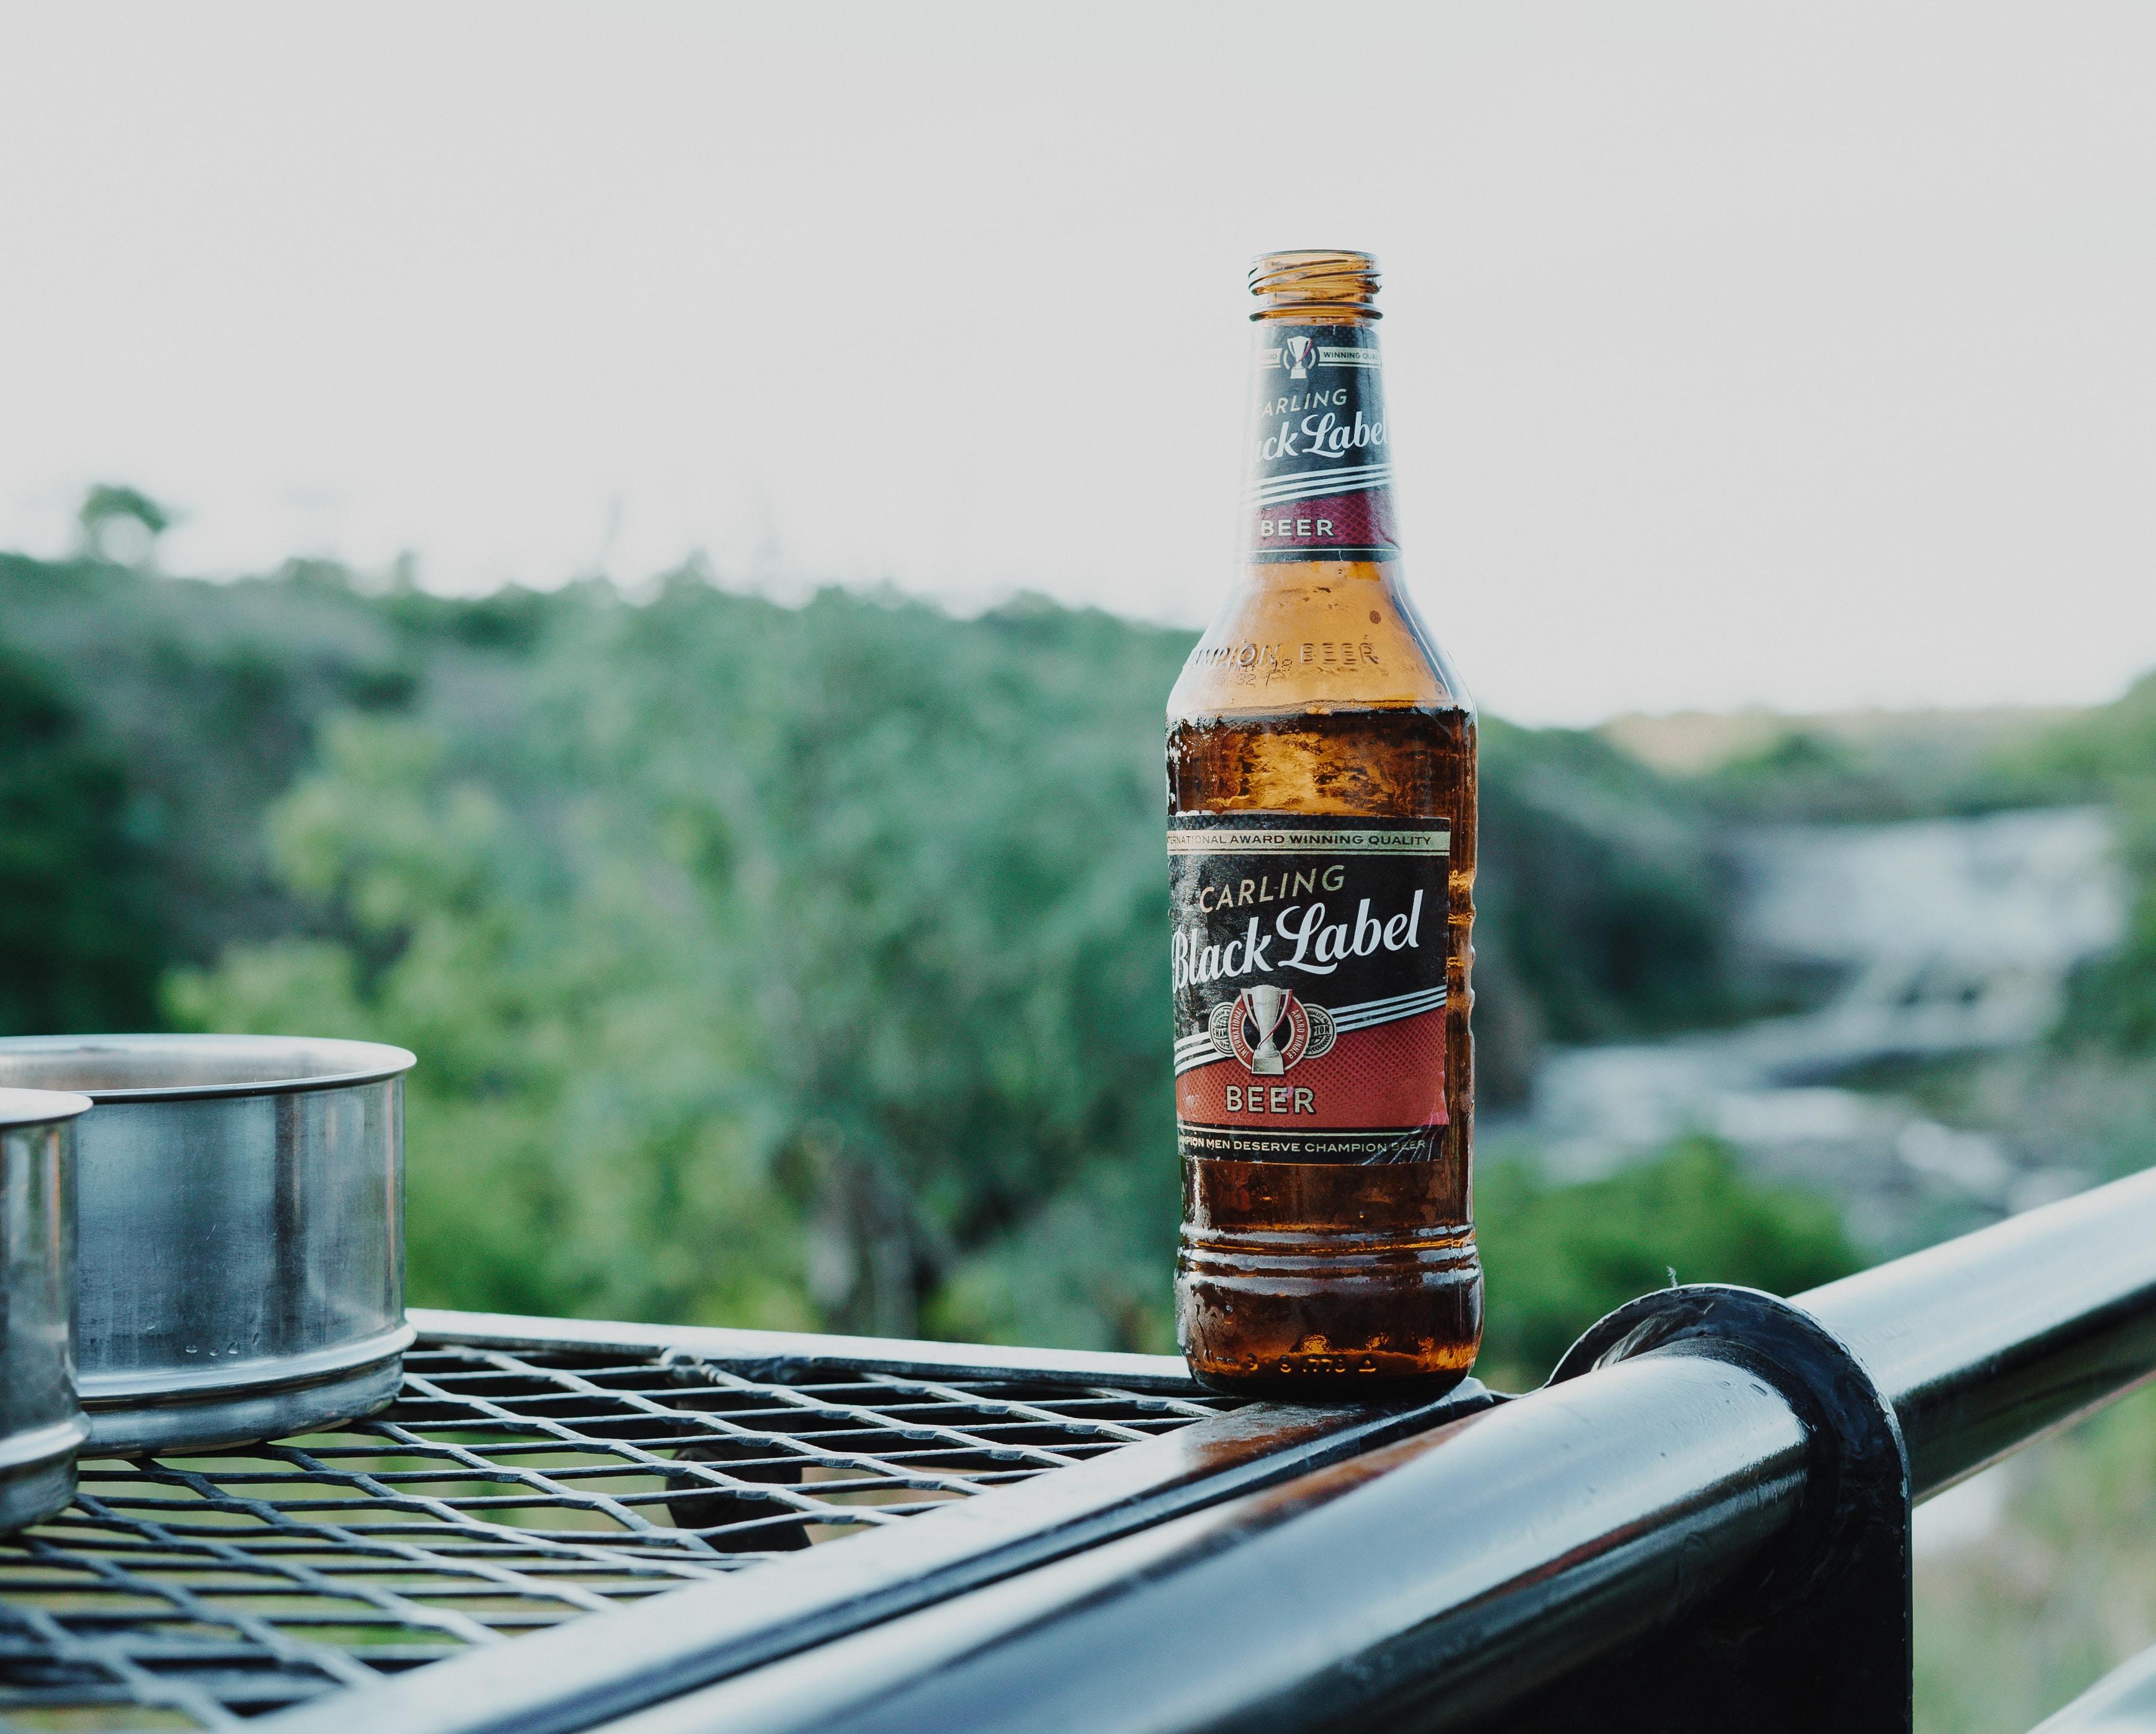 brown glass bottle on grey metal rail